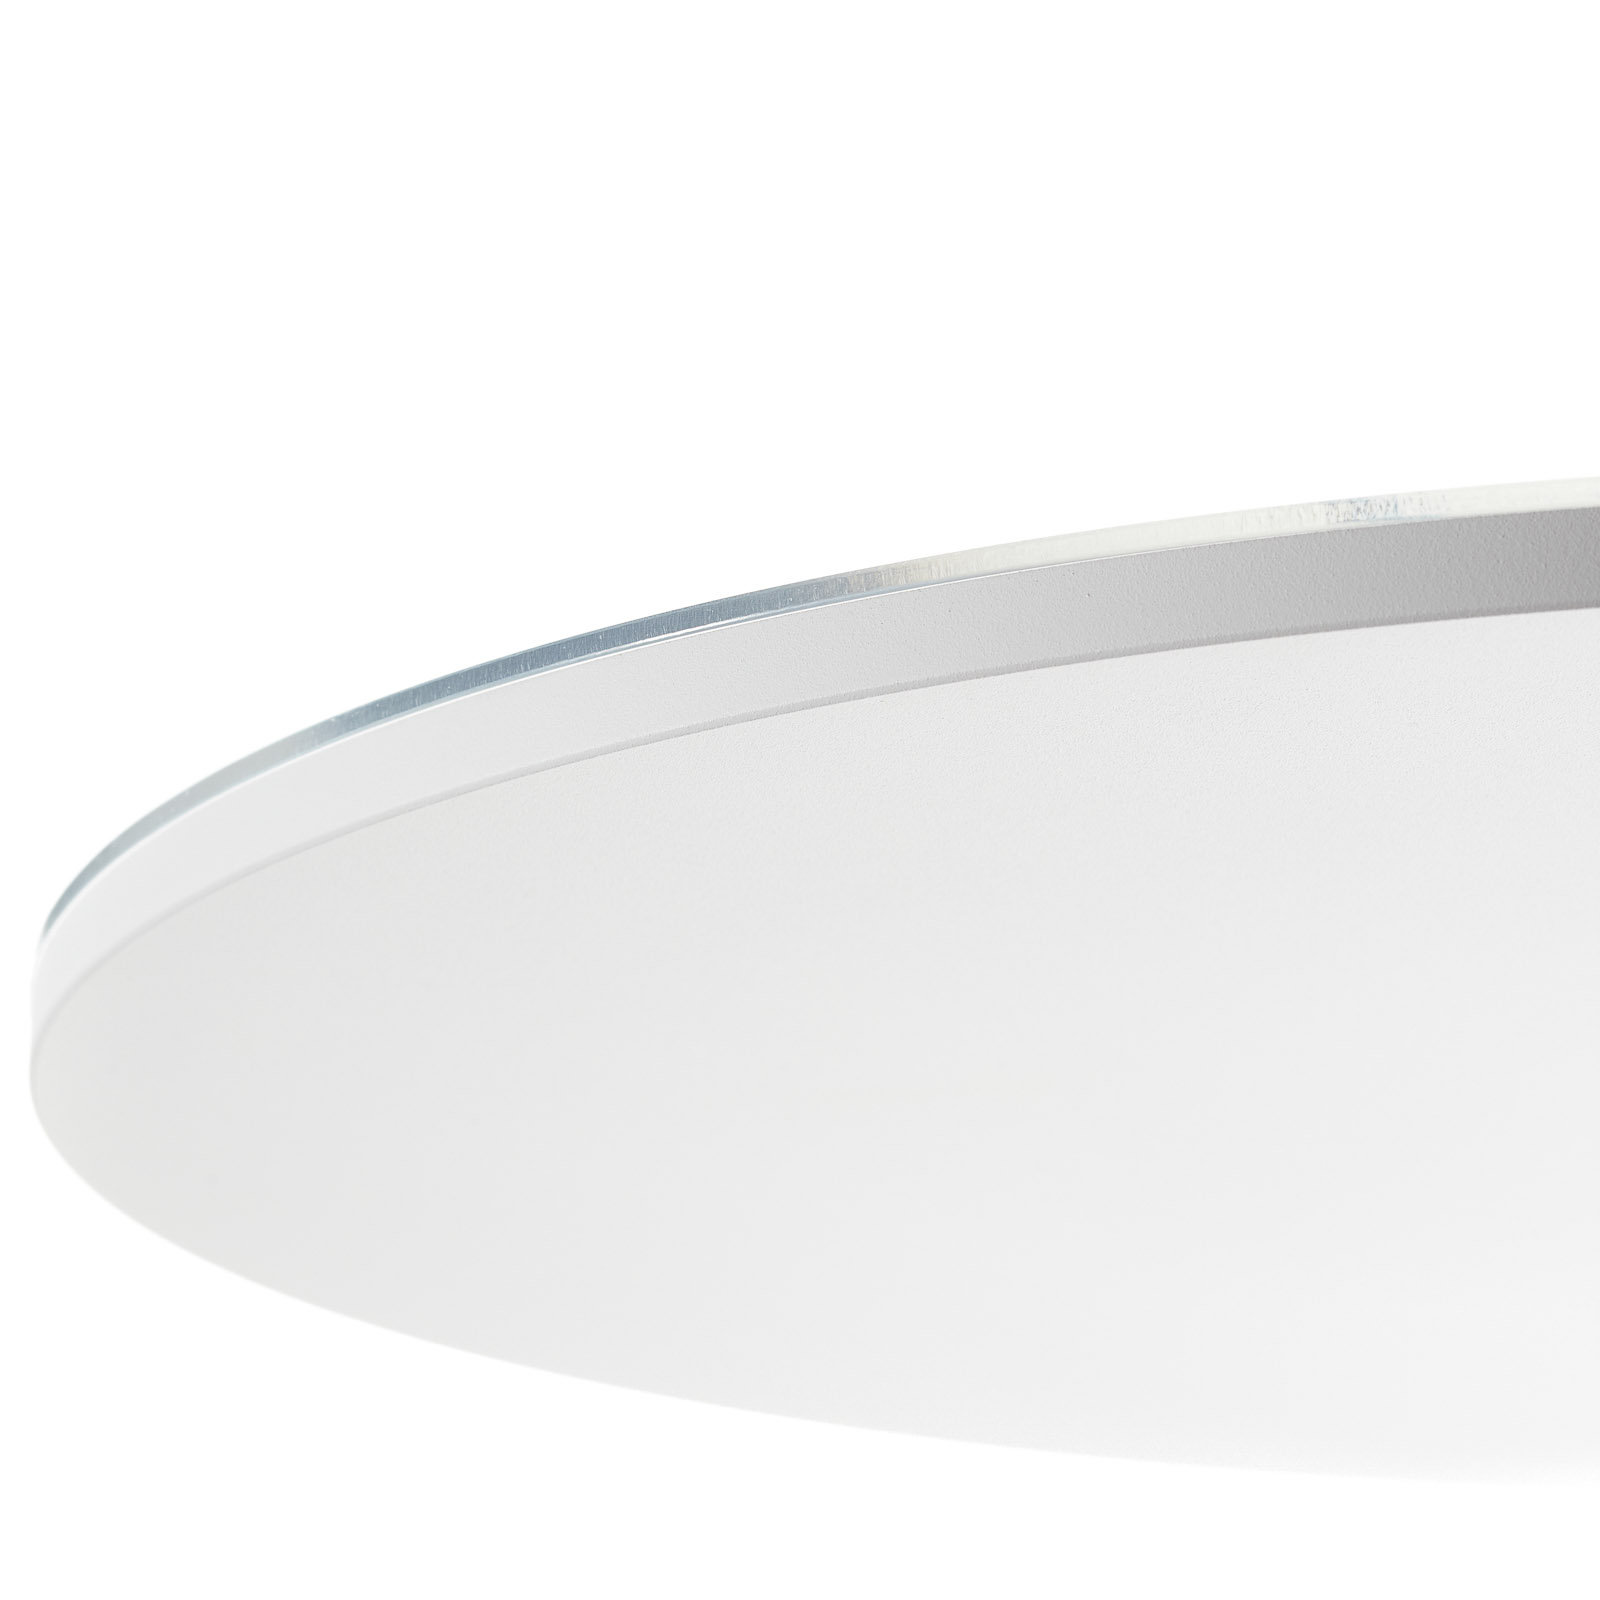 Holtkötter Plano XL-LED-kattovalaisin strukturoitu